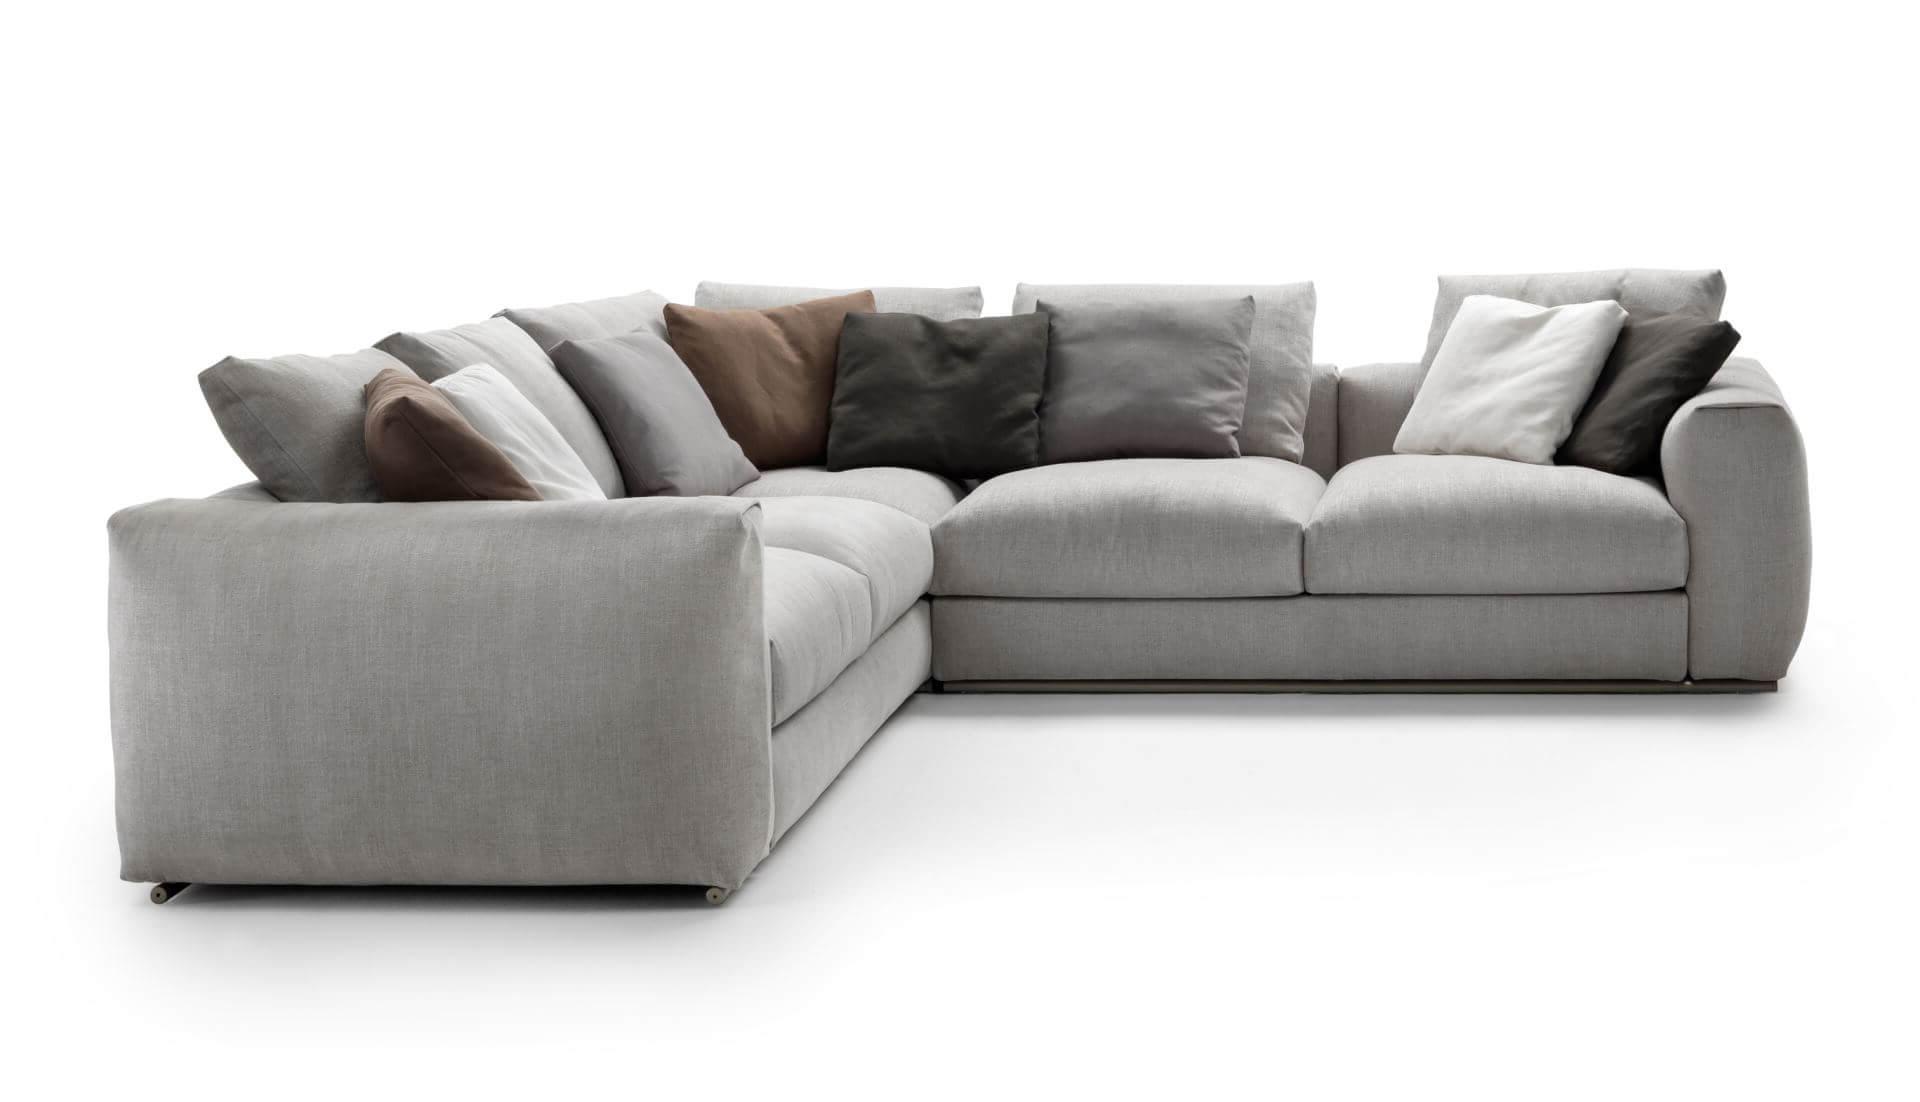 Famous Dream Navy 2 Piece Modular Sofas Within Flexform Asolo Modular Sofa – Dream Design Interiors Ltd (View 6 of 20)